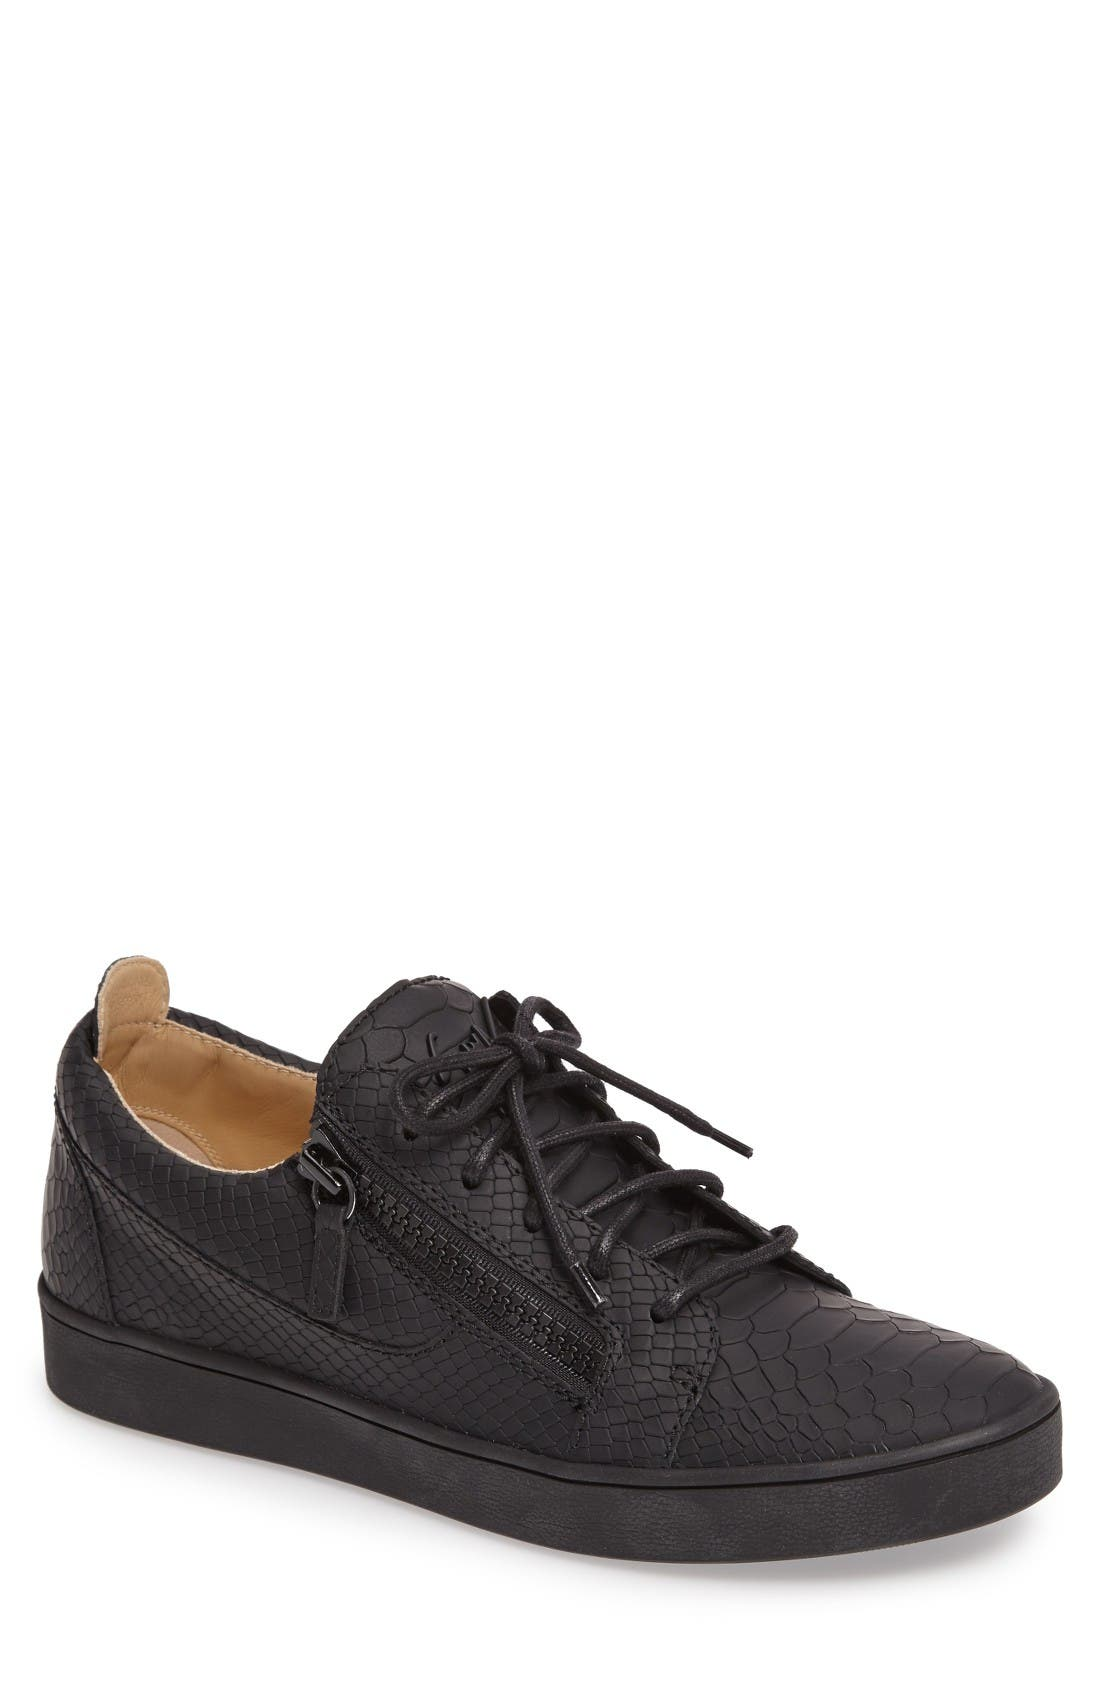 GIUSEPPE ZANOTTI Embossed Side Zip Sneaker